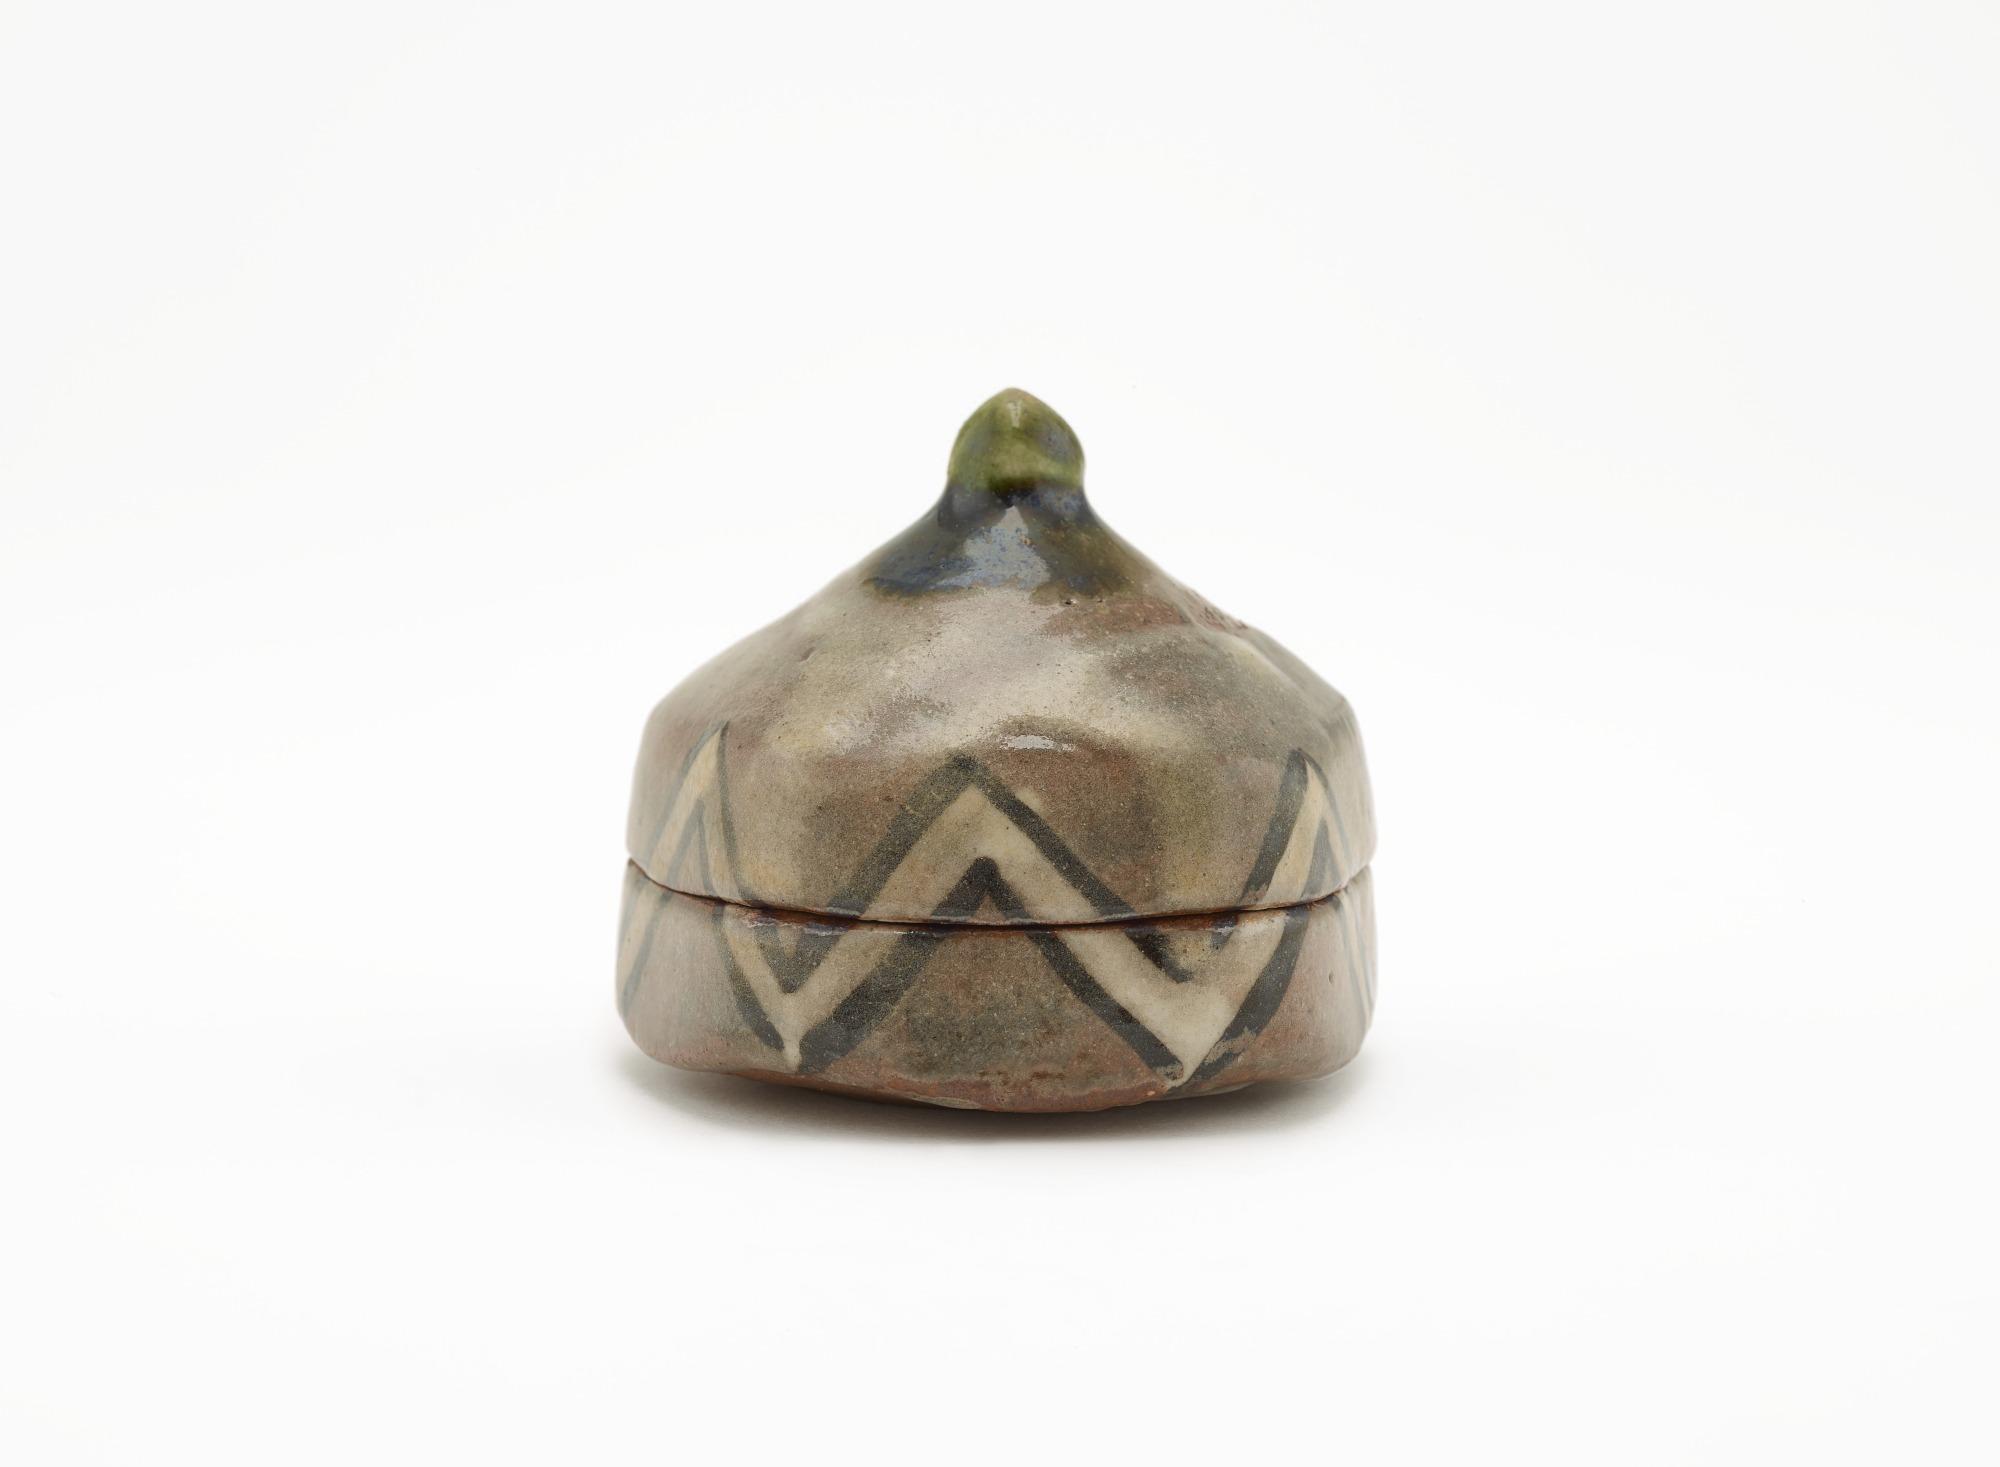 Pentagonal incense box in Oribe style